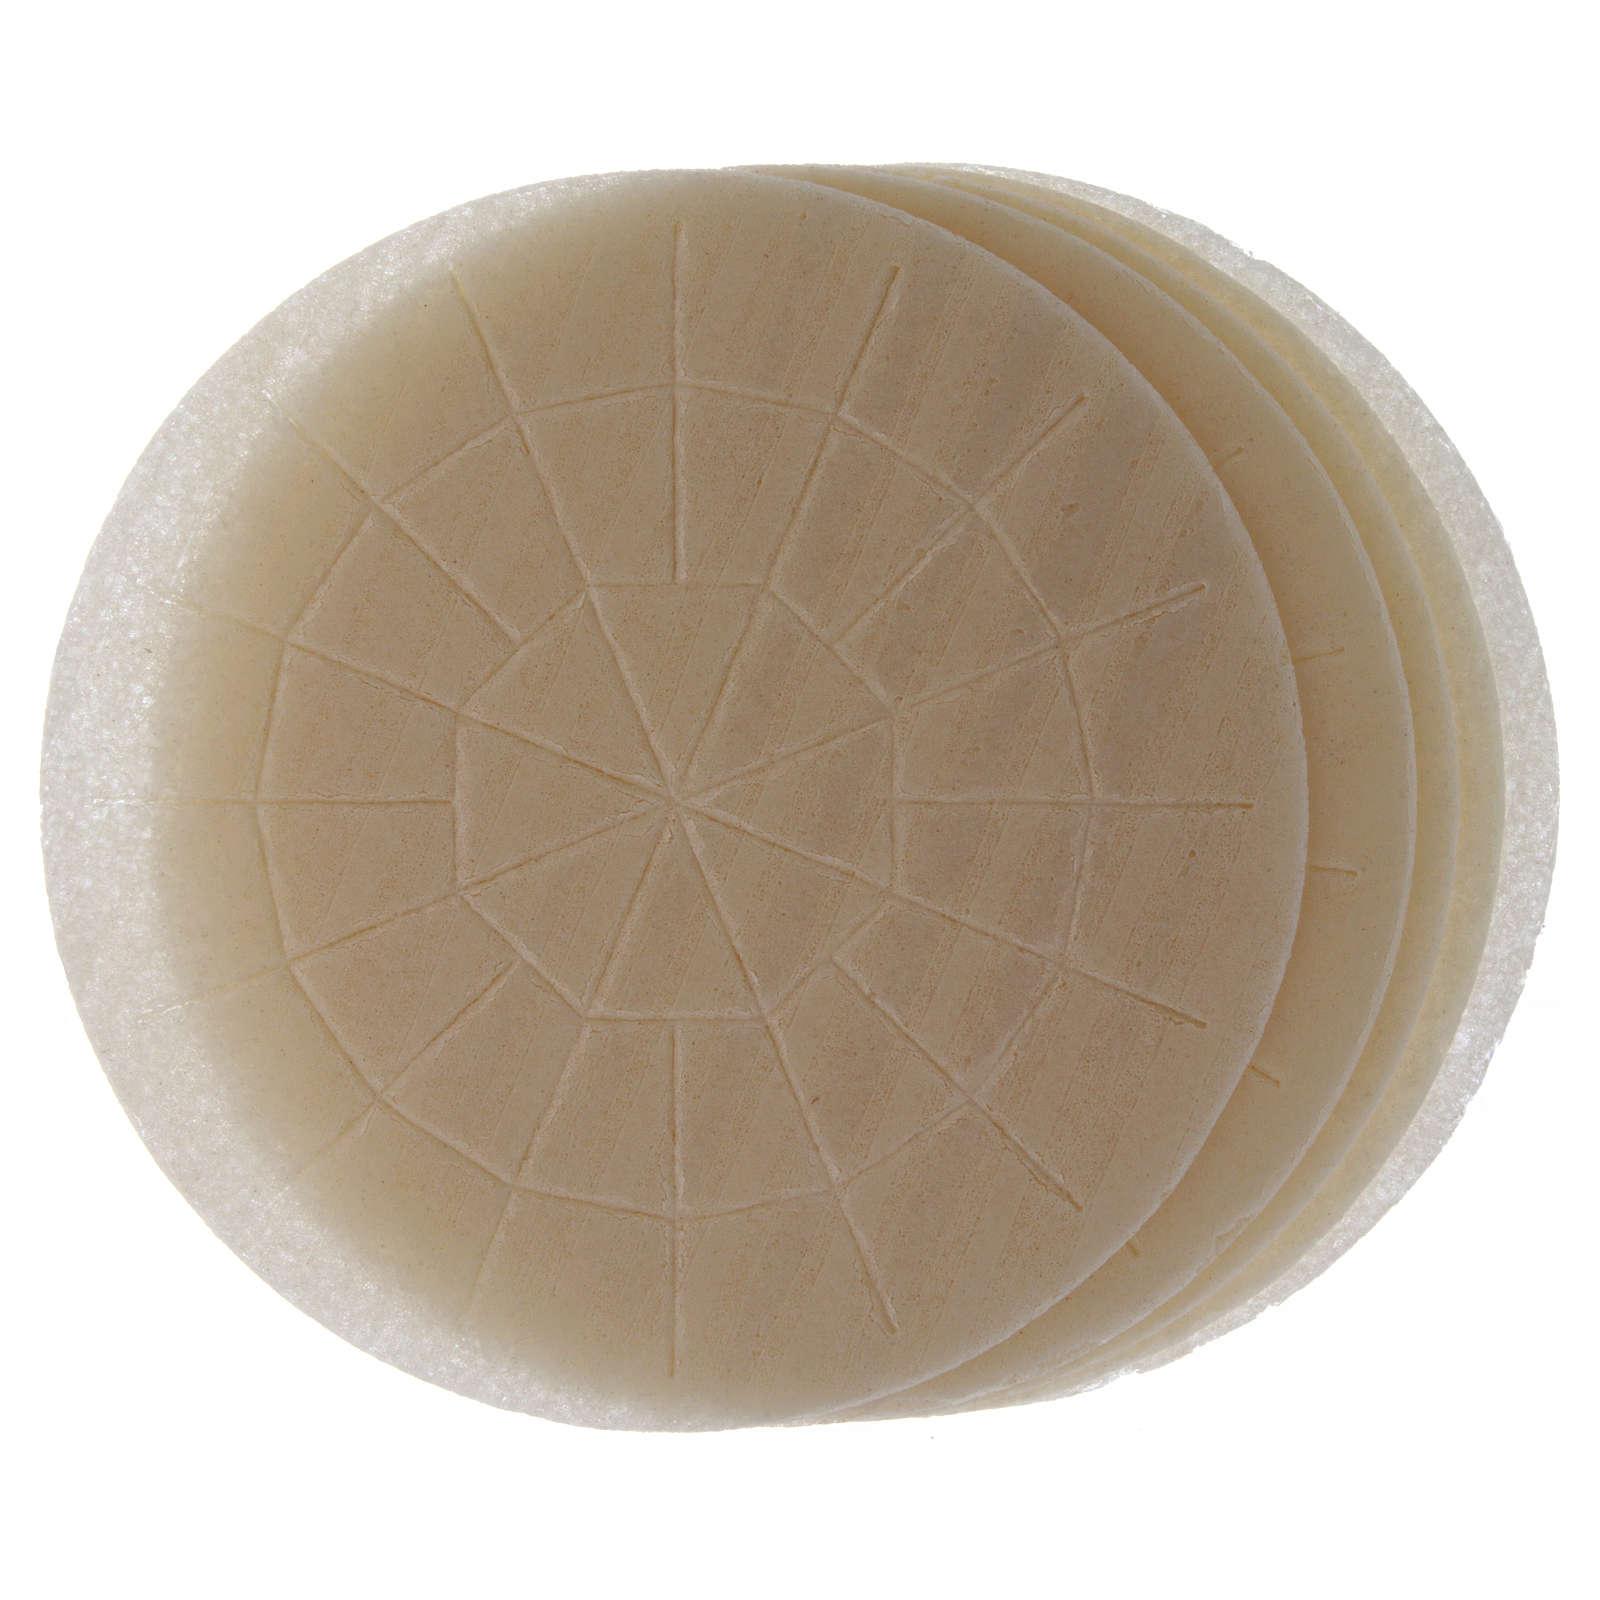 Concelebration holy bread 22 cm 5 pieces 3